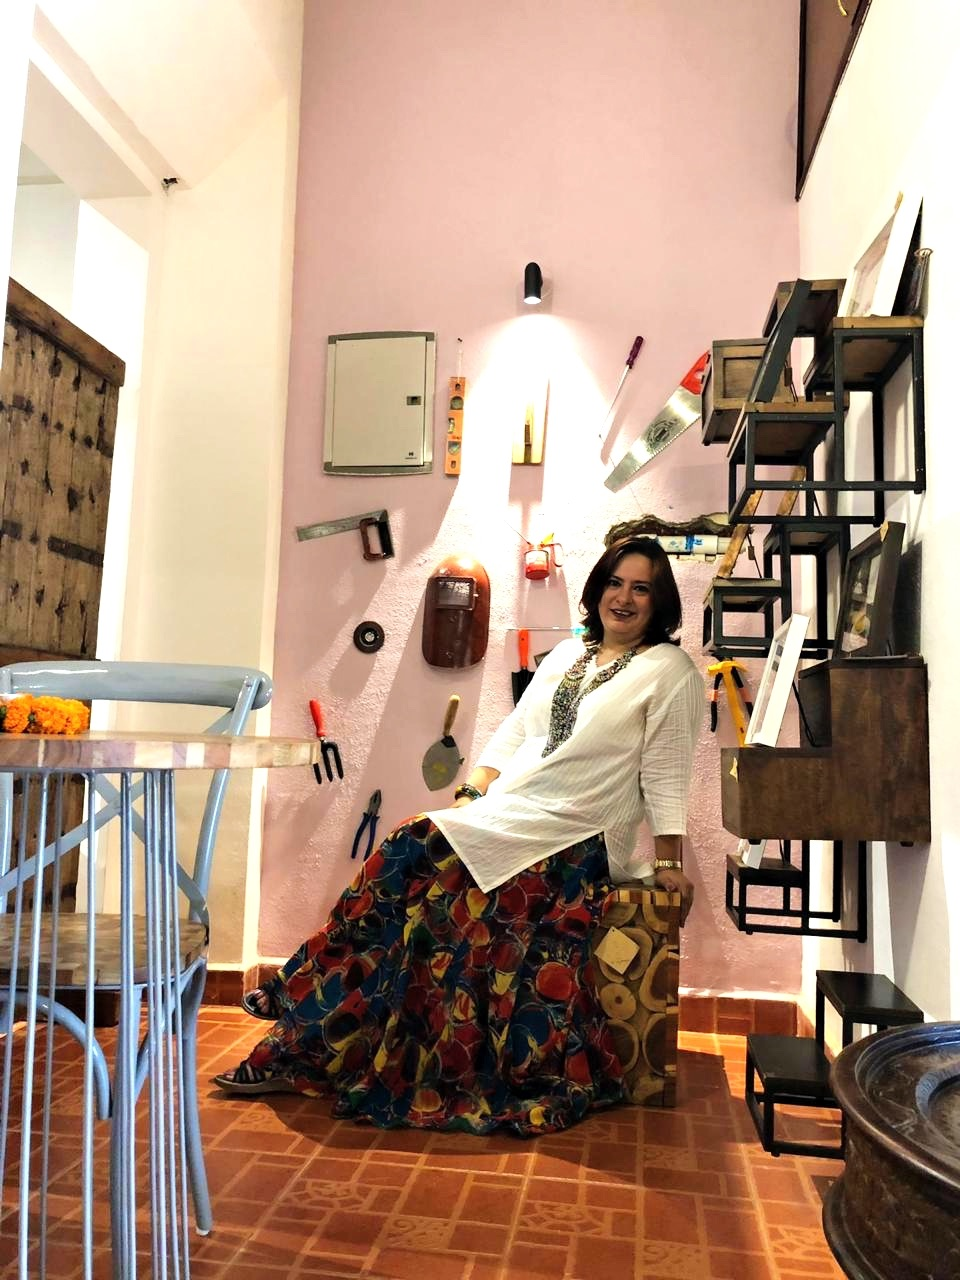 Vaishnavipratima, Goa's most noteworthy lifestyle store showcases its signature collection